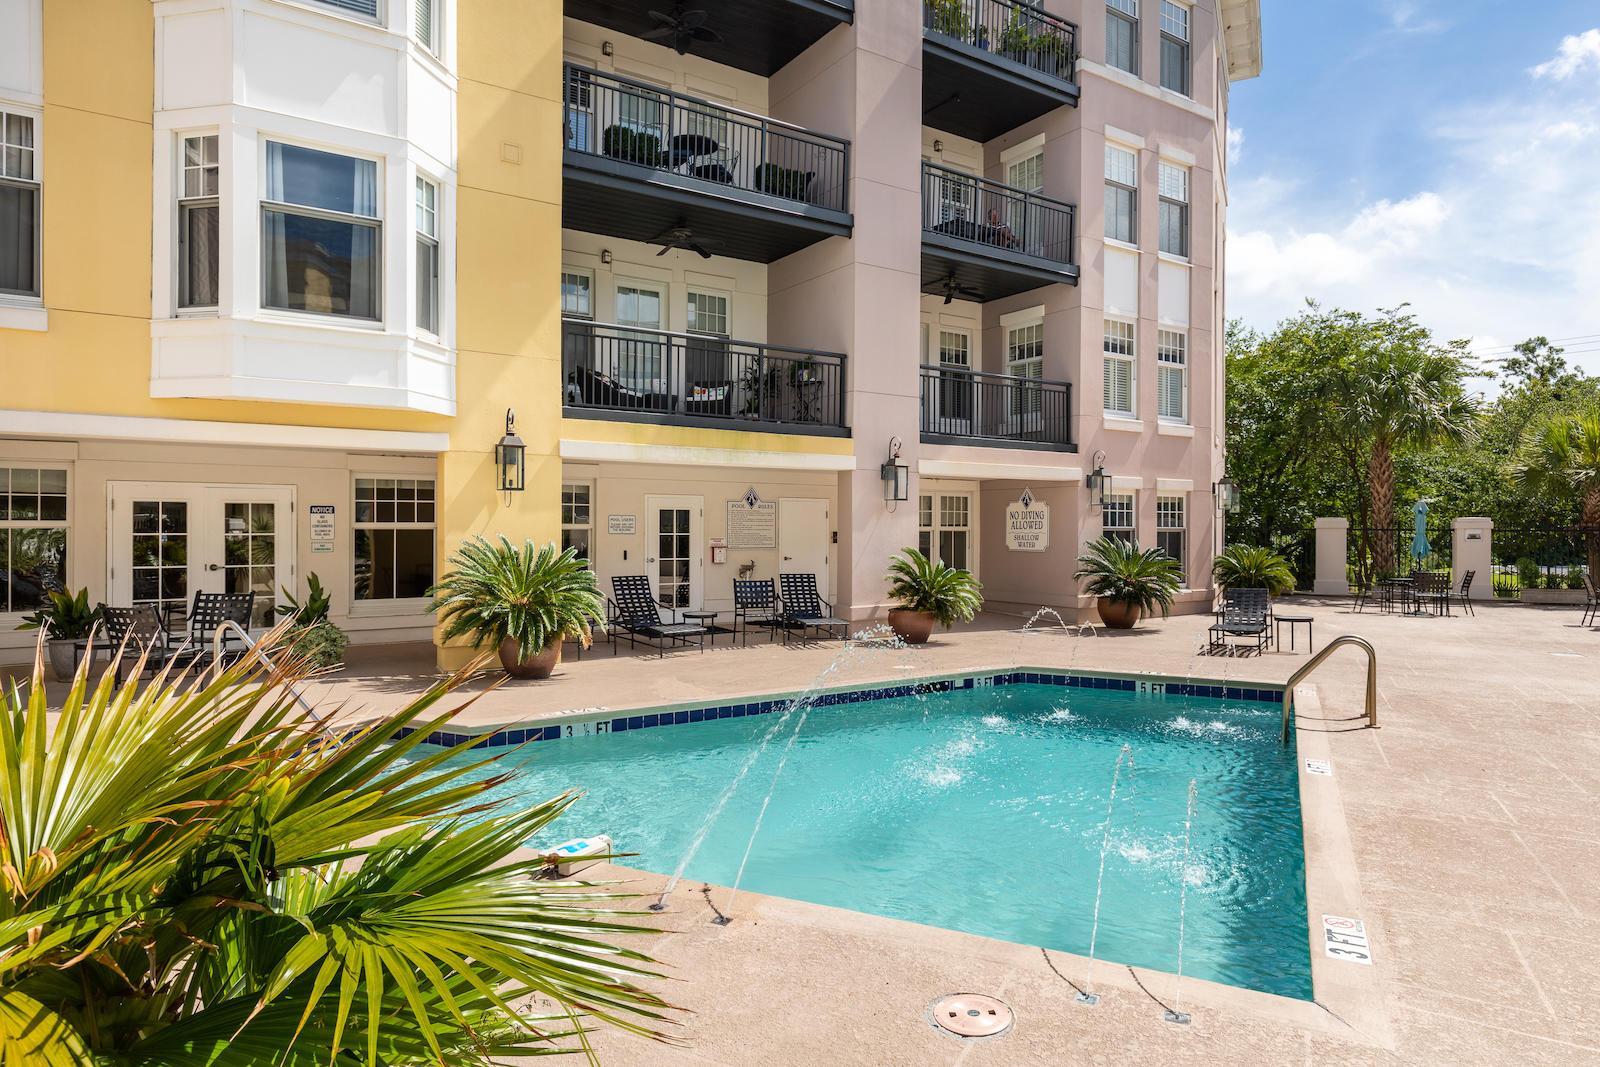 Albemarle Condos For Sale - 498 Albemarle, Charleston, SC - 15